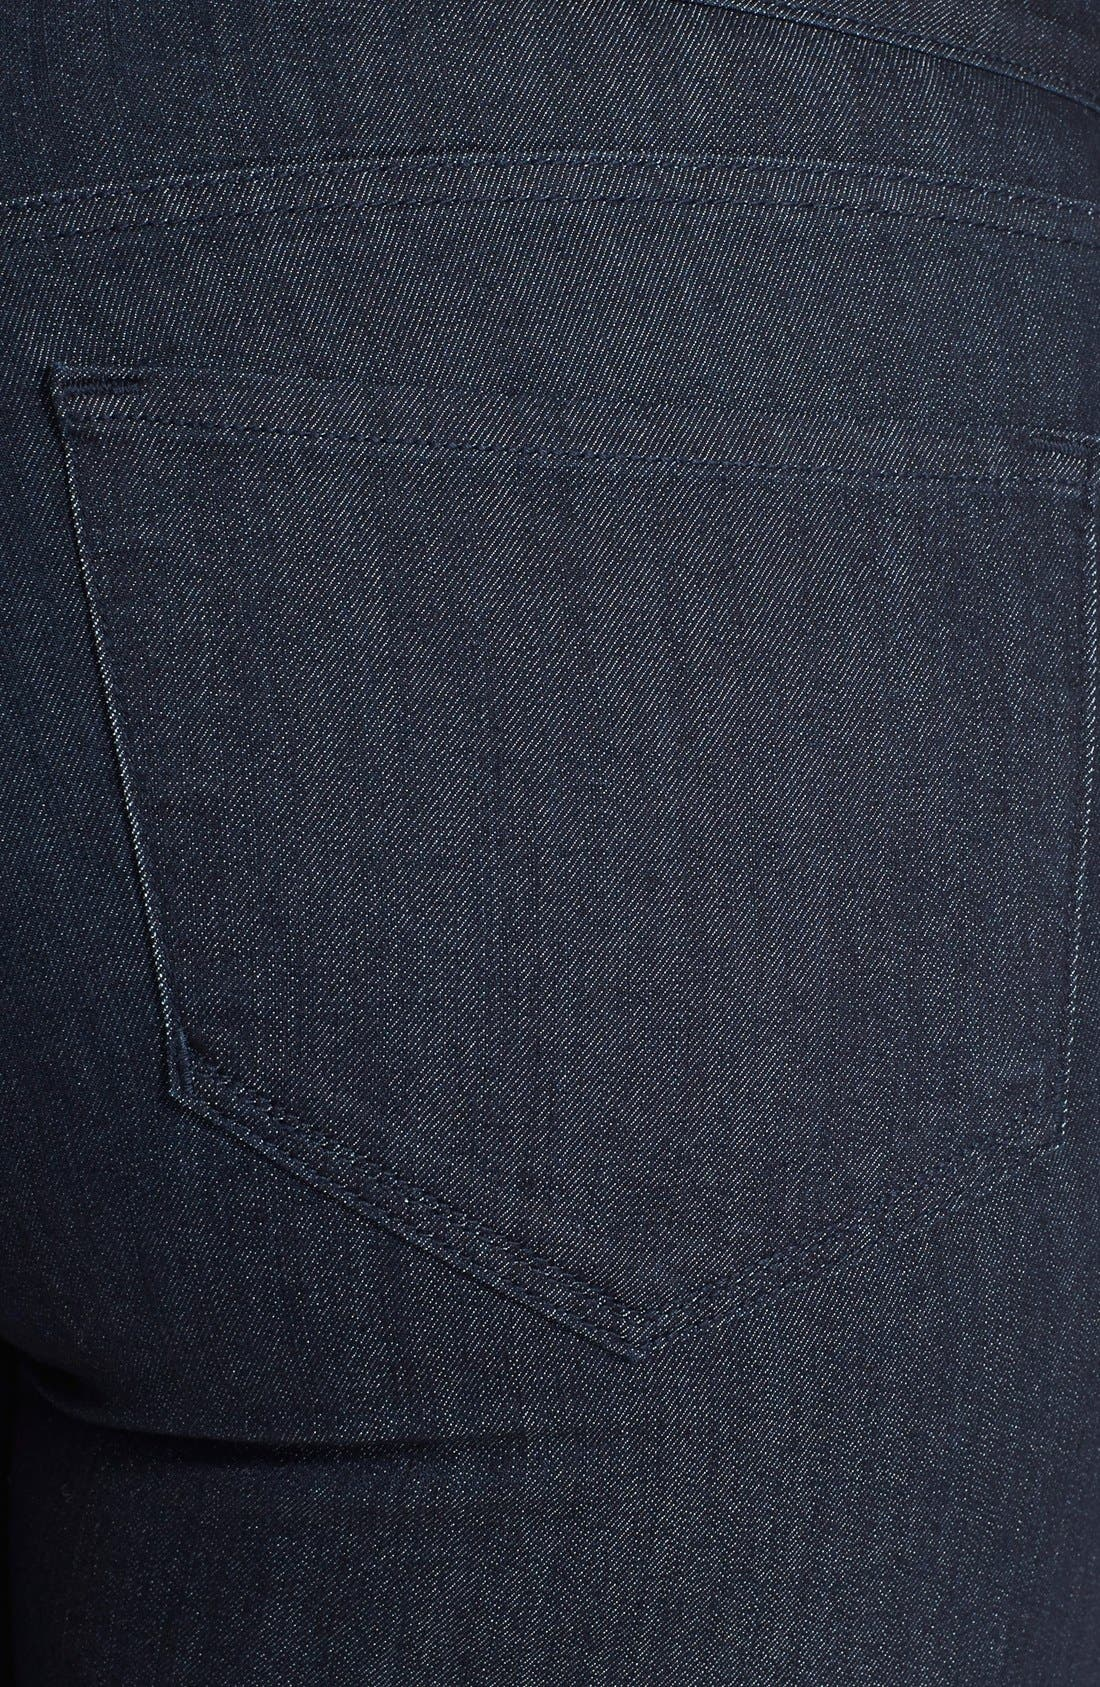 'Ami' Tonal Stitch Stretch Skinny Jeans,                             Alternate thumbnail 3, color,                             Dark Enzyme